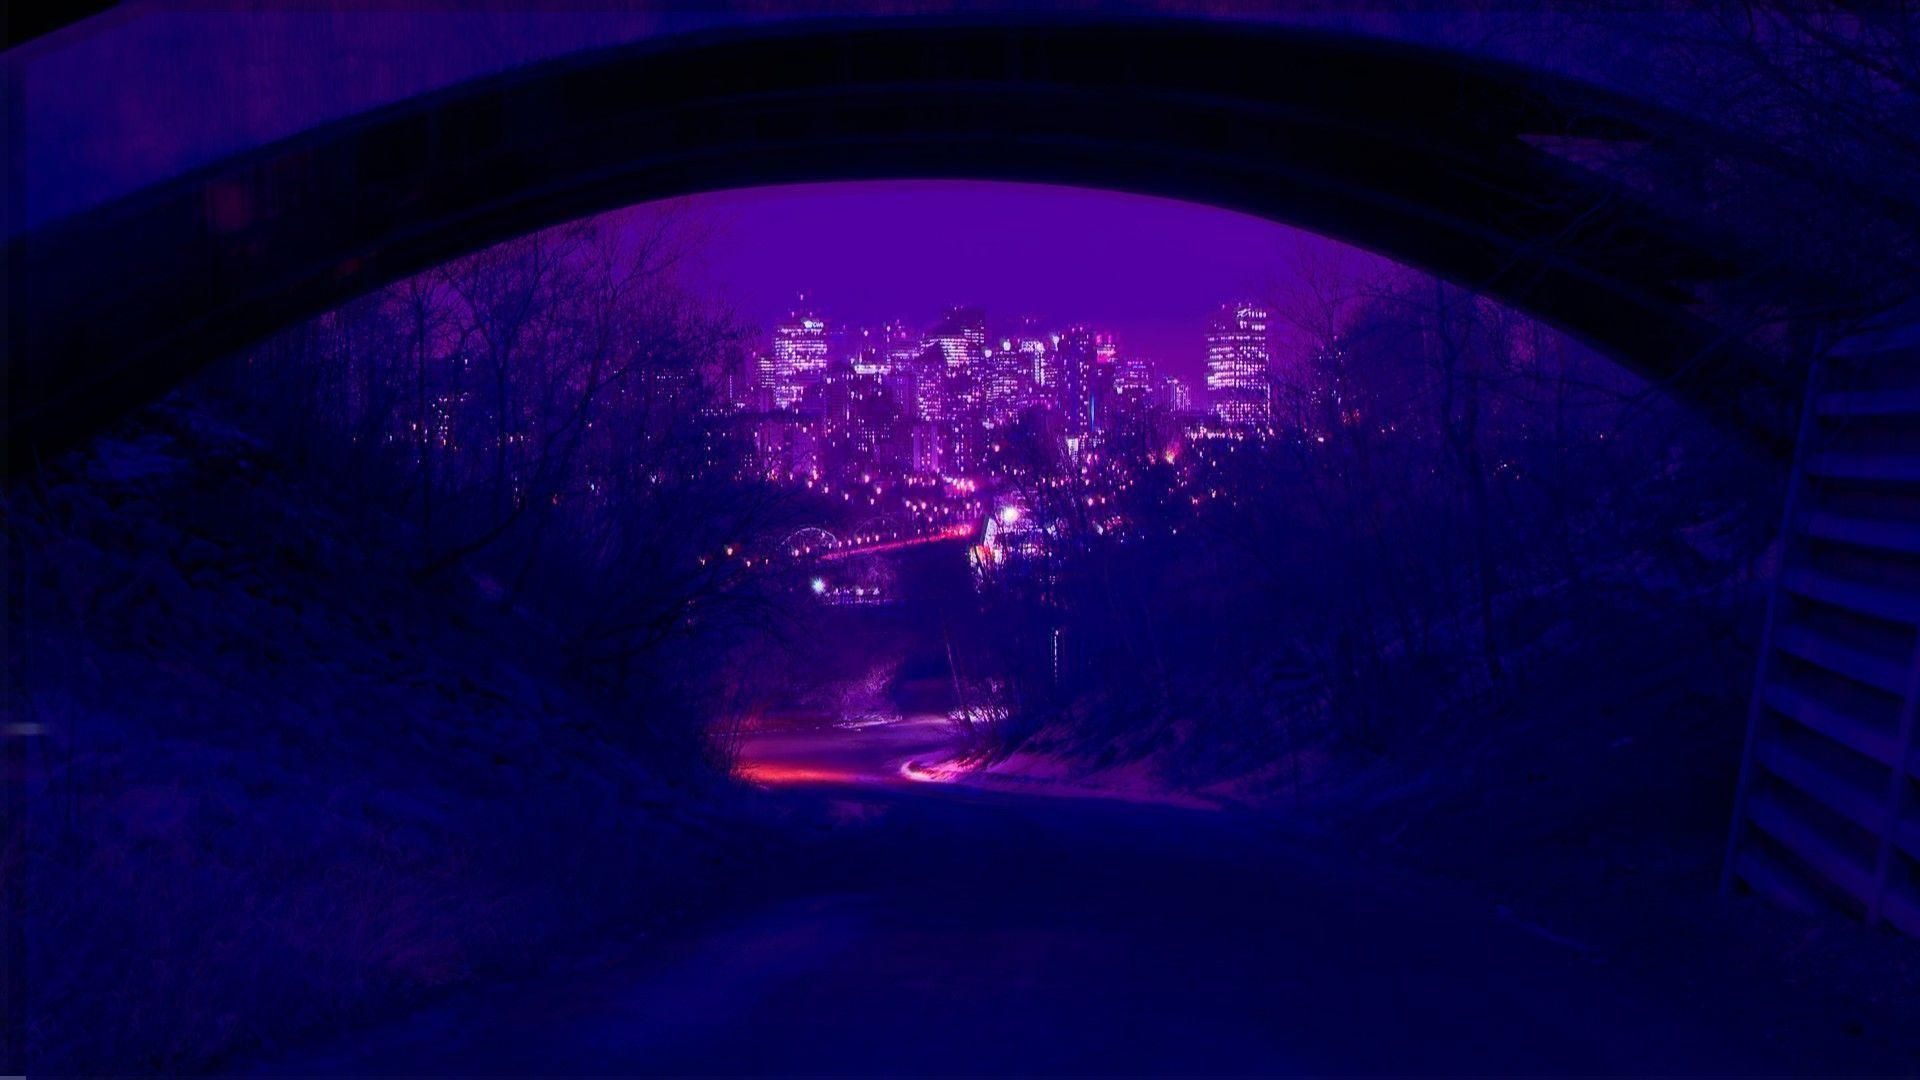 Pin On Wallpaper Neon Wallpaper Aesthetic Desktop Wallpaper Aesthetic Wallpapers Dark purple aesthetic computer wallpaper